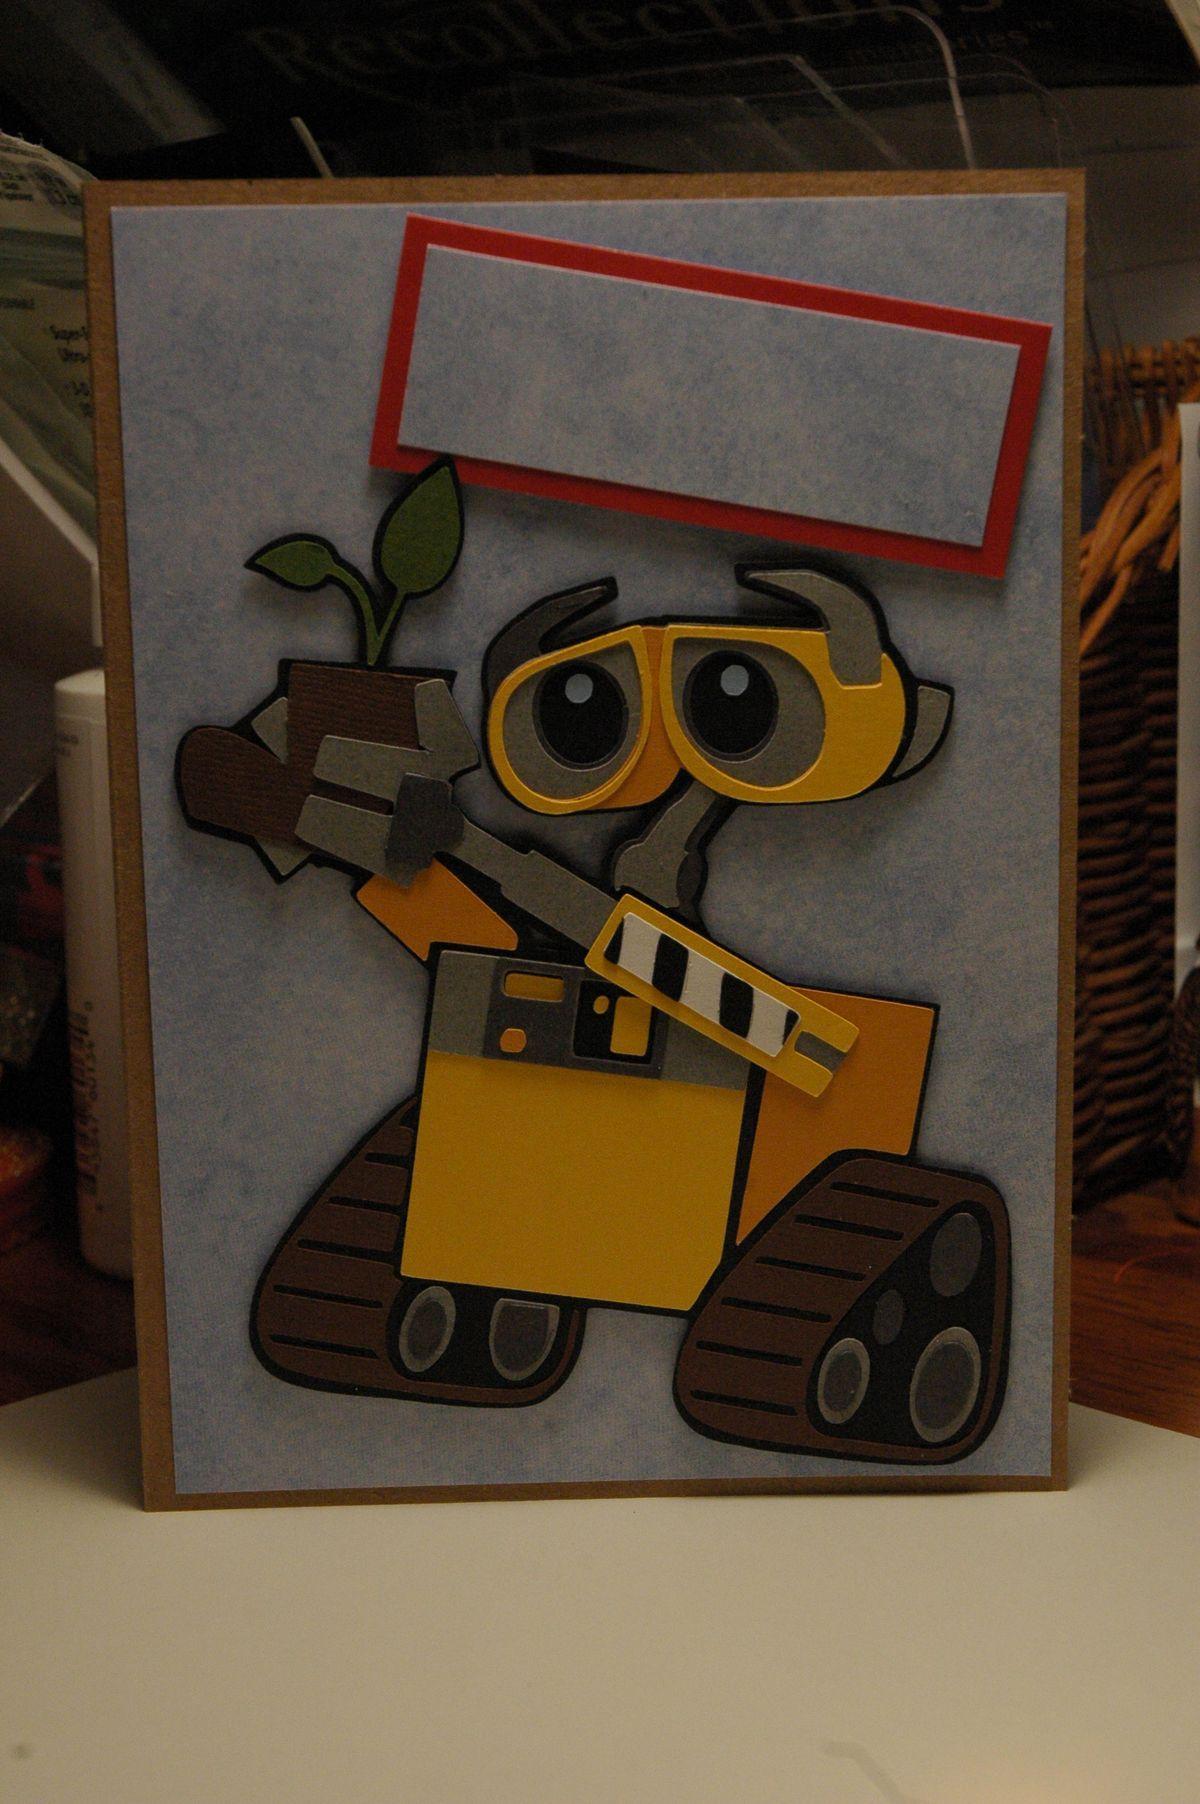 Pin by Susan AmickMangrum on kids cards Kids cards, Get